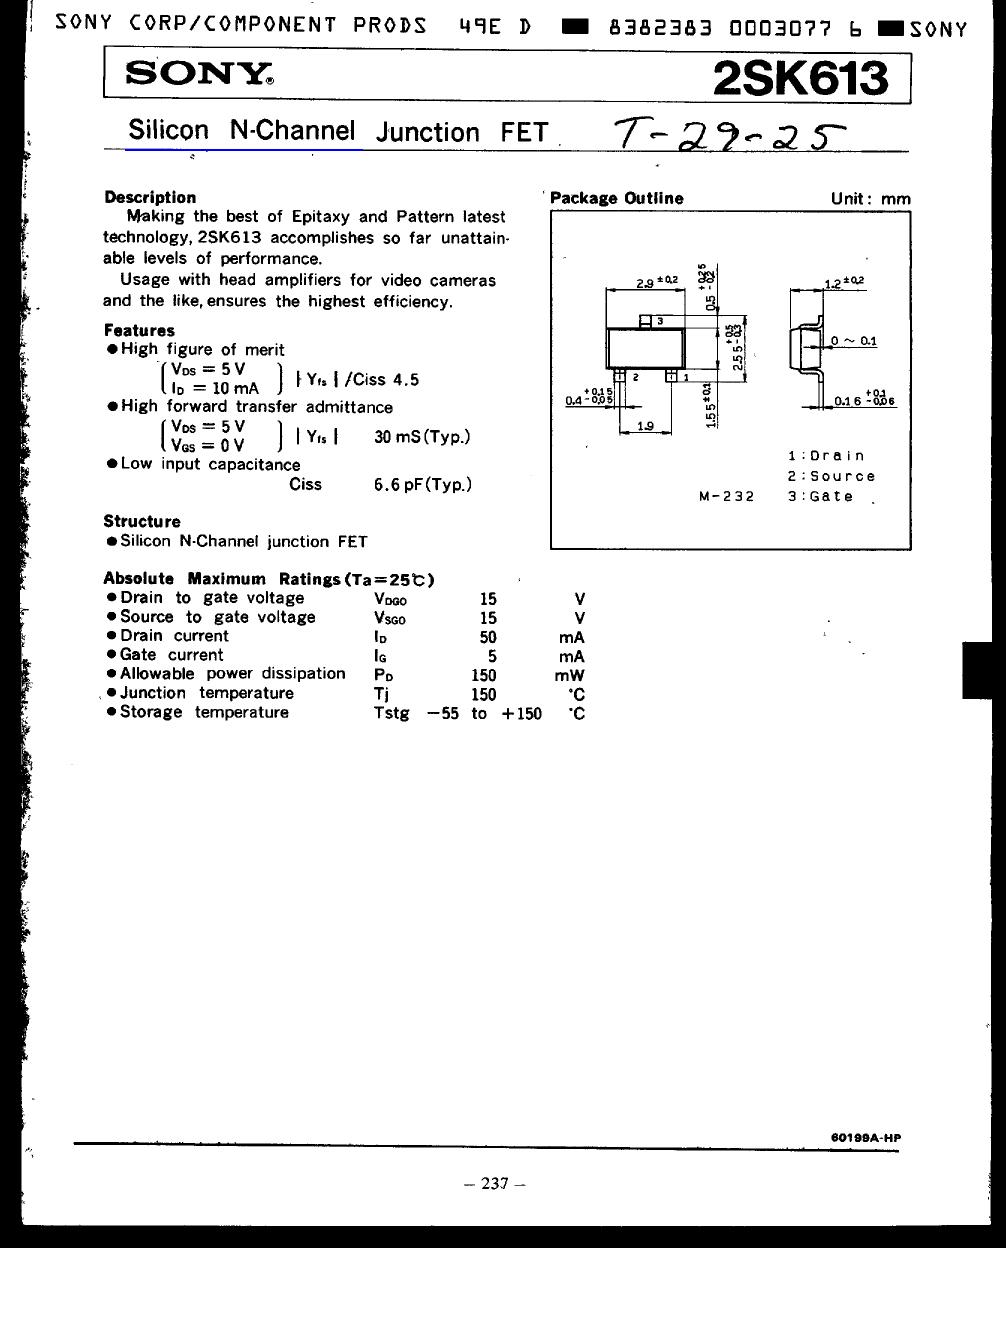 2SK613 datasheet